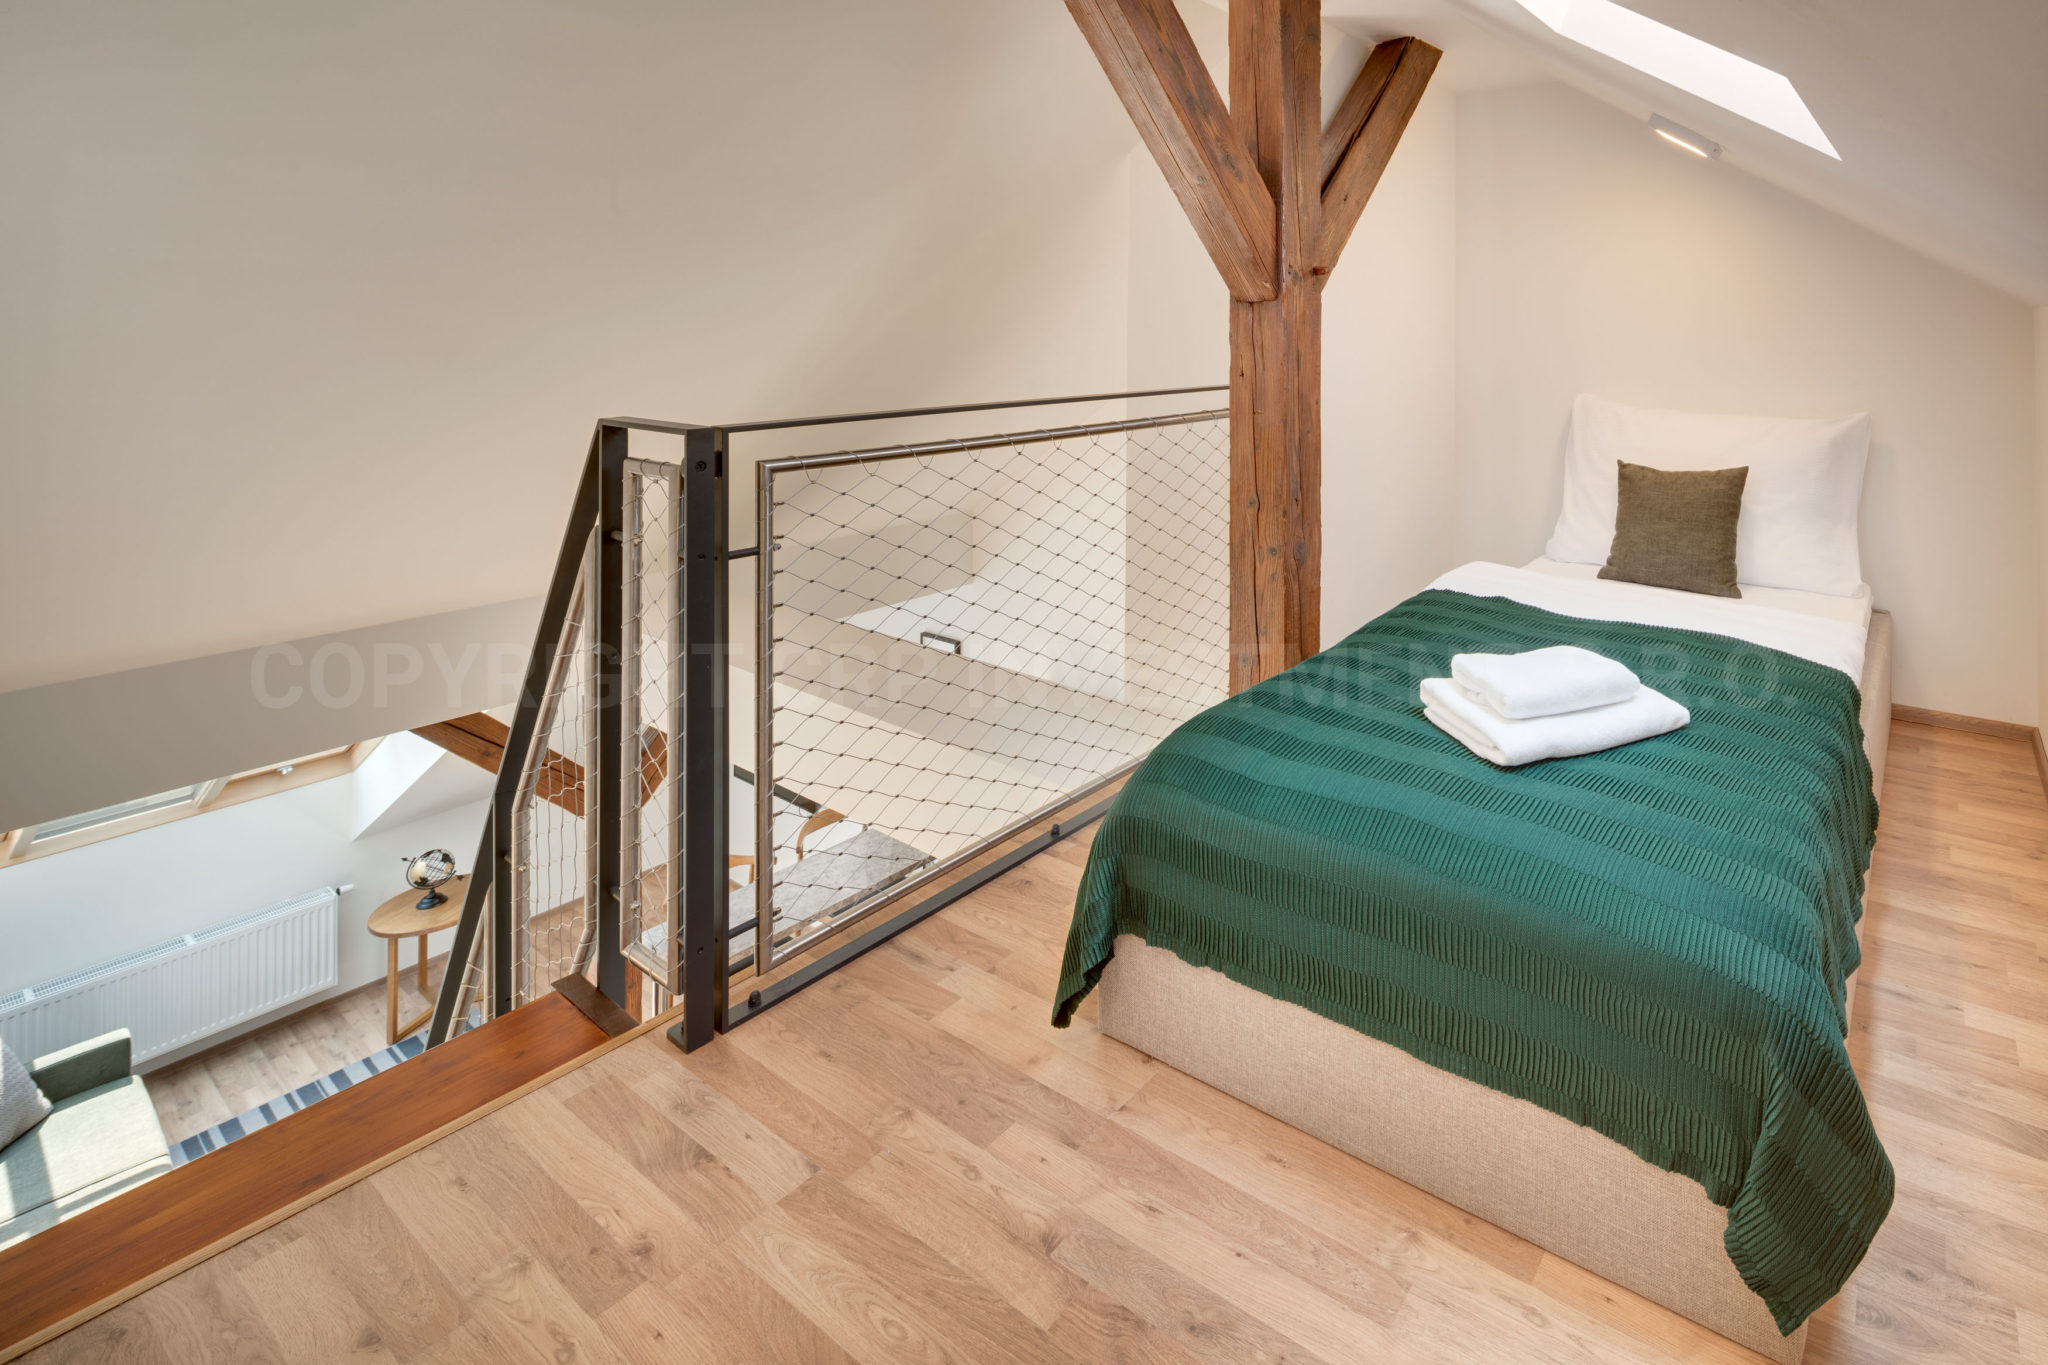 Duplex Apartmán s 1 ložnici k pronájmu v Praze